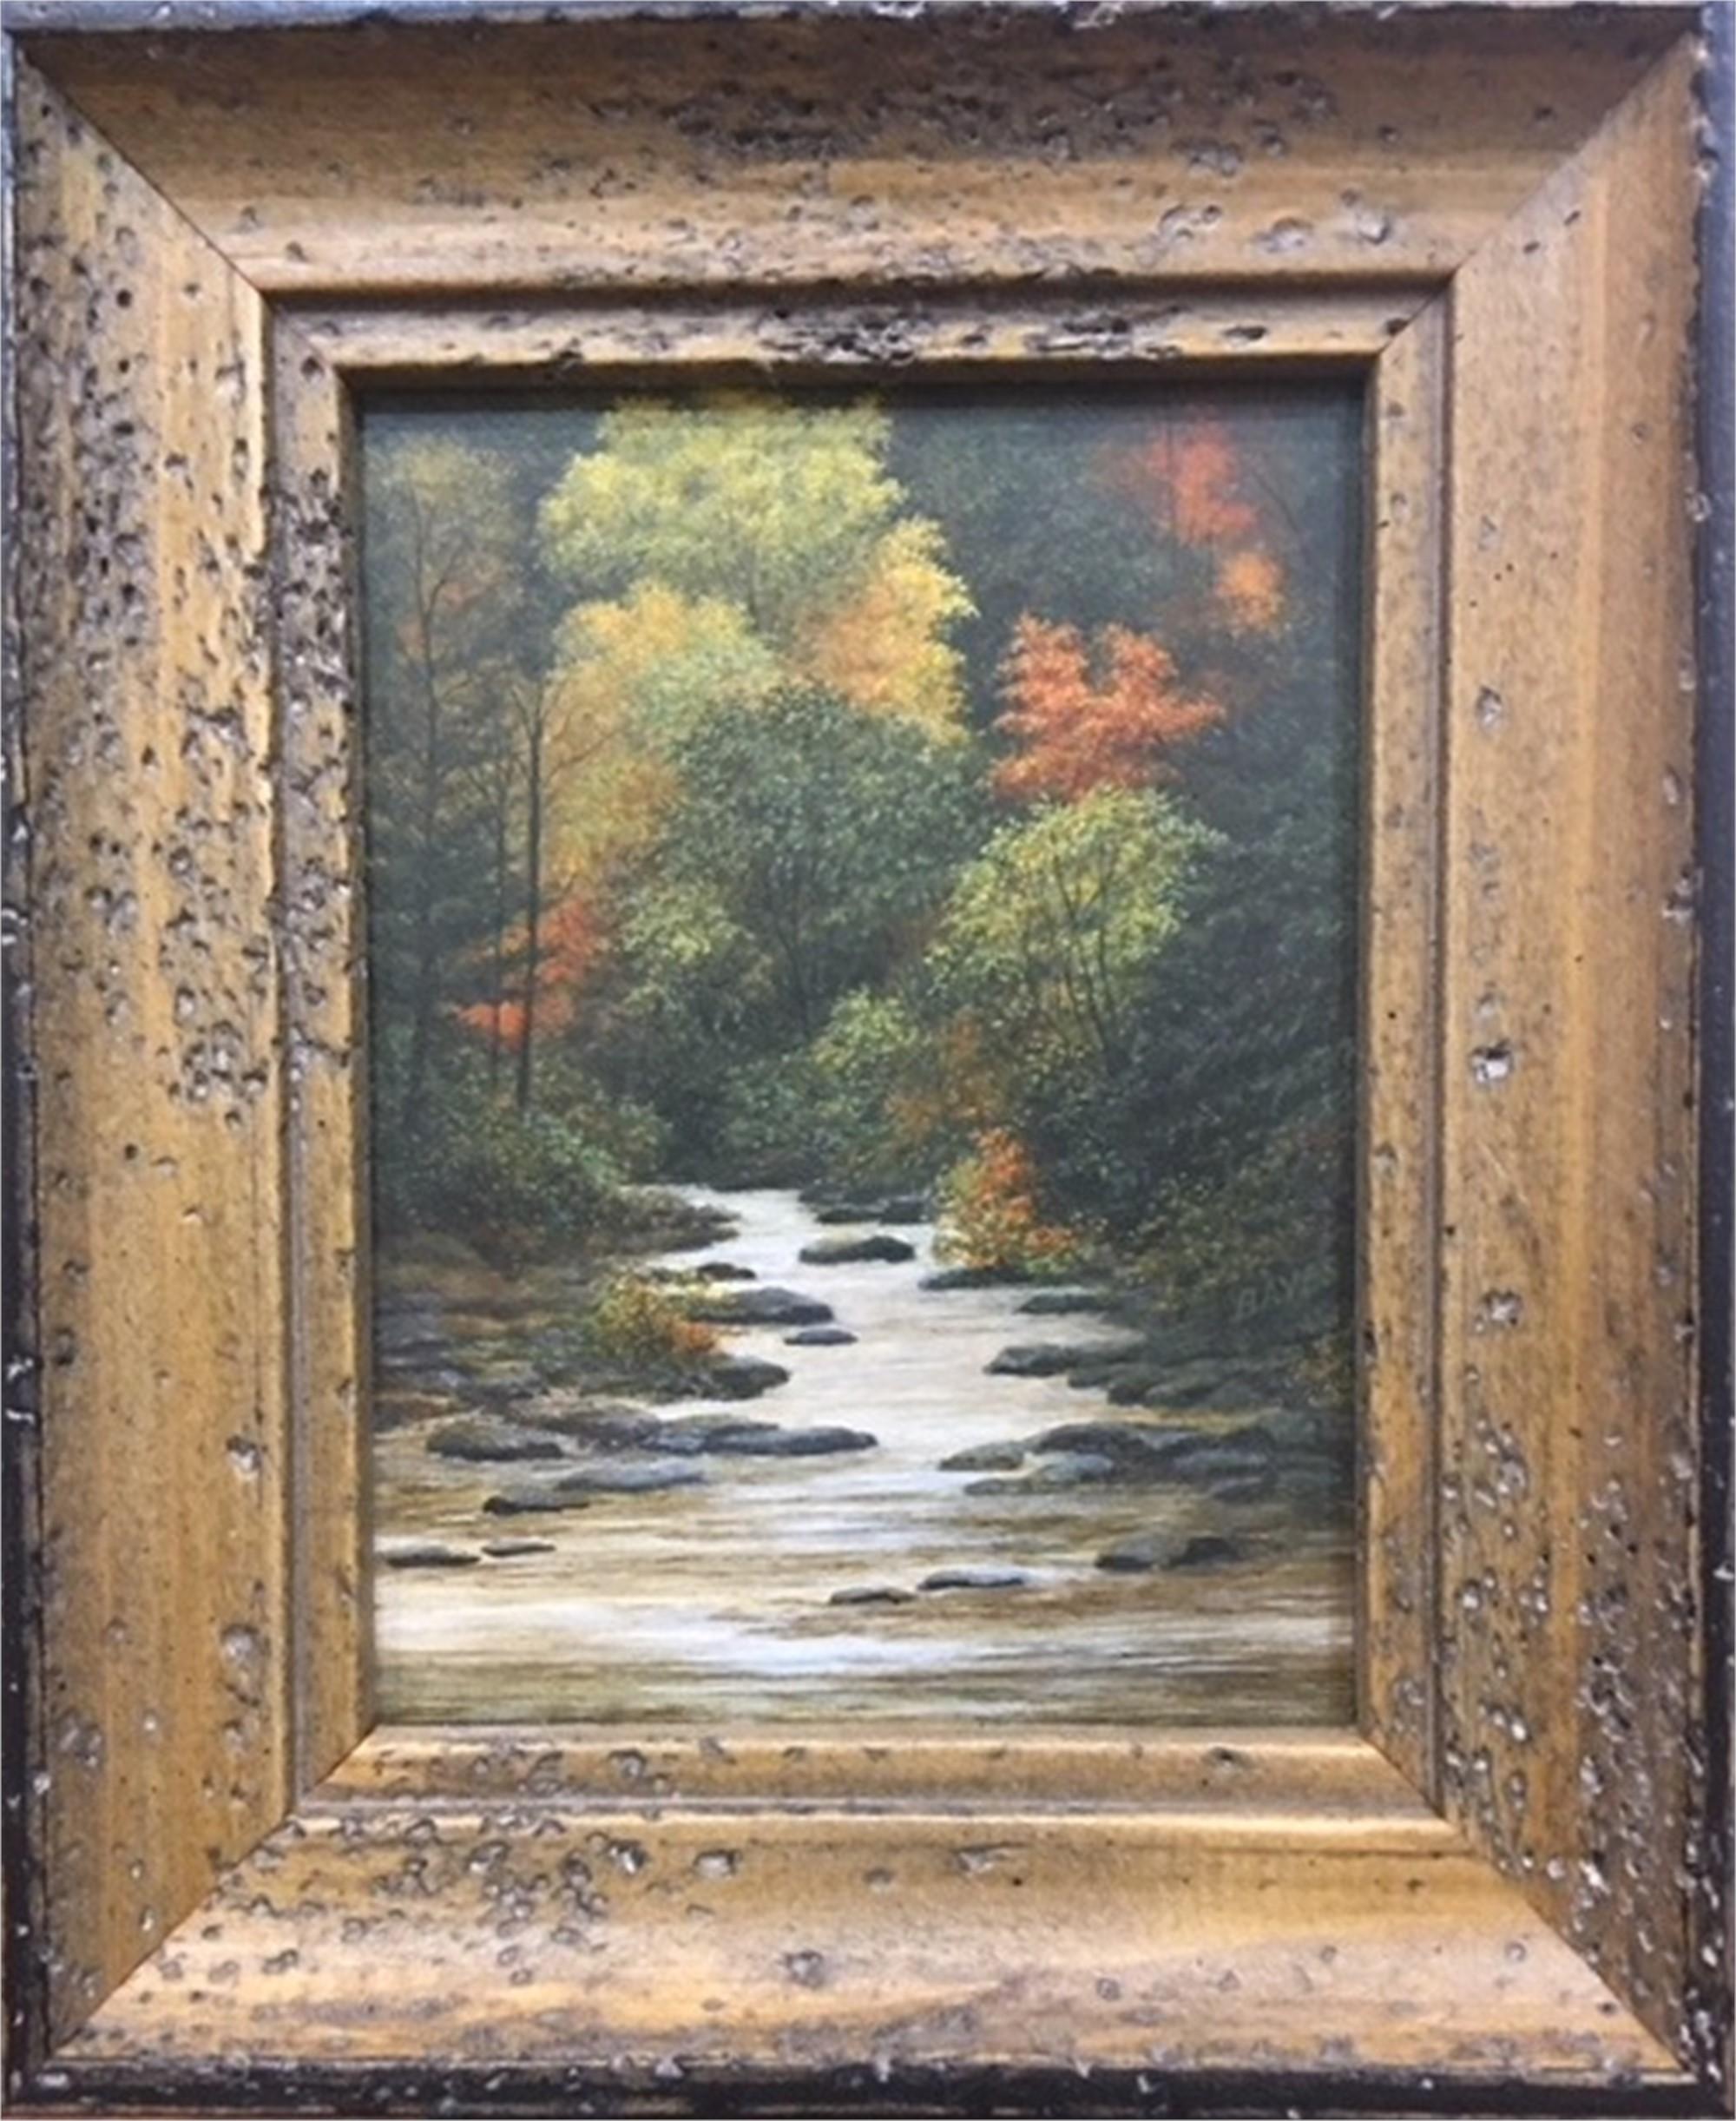 Autumn Palette - miniature painting by Judith Edgington Bayes